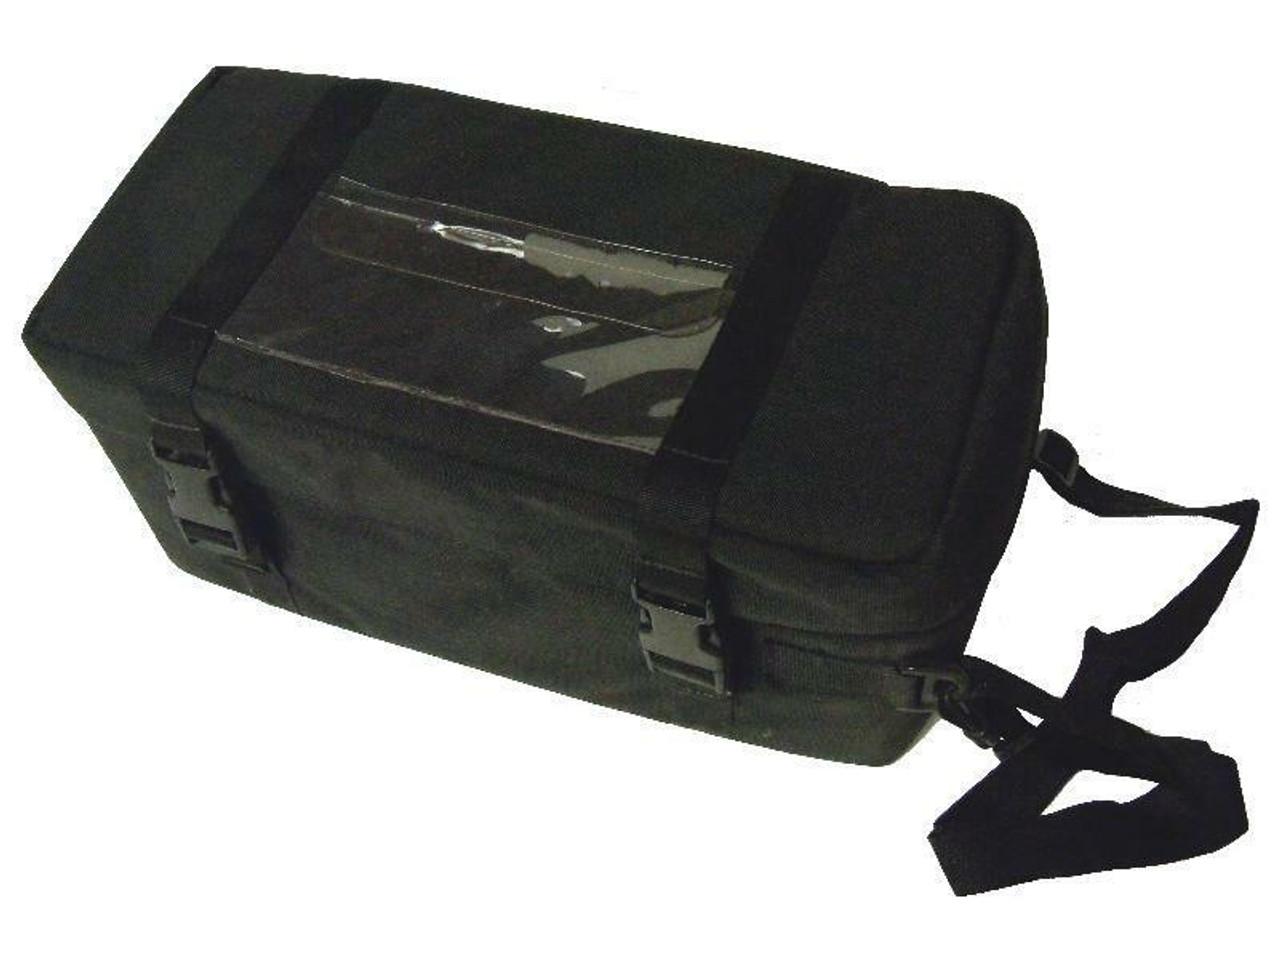 PVS-4 PVS-17 Aquila 4X Night Vision Weapon Sight Thermal Carrying Case w Cushion